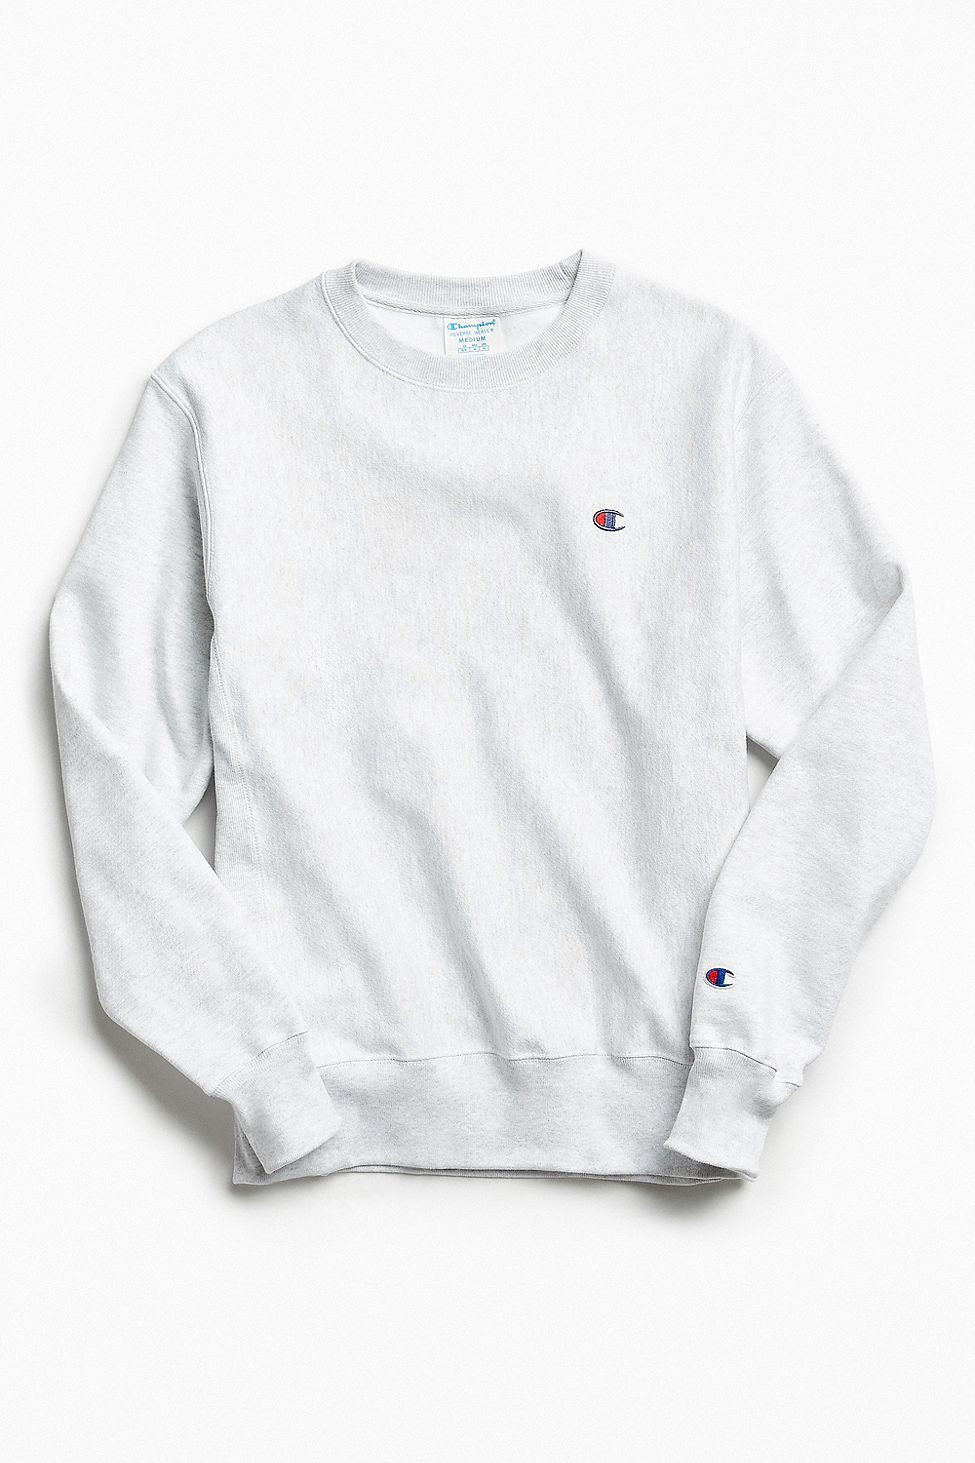 Urban Outfitters Champion Reverse Weave Fleece Crew Neck Sweatshirt Light Grey Xxl Sweatshirts Crew Neck Sweatshirt Grey Champion Sweatshirt [ 1463 x 975 Pixel ]